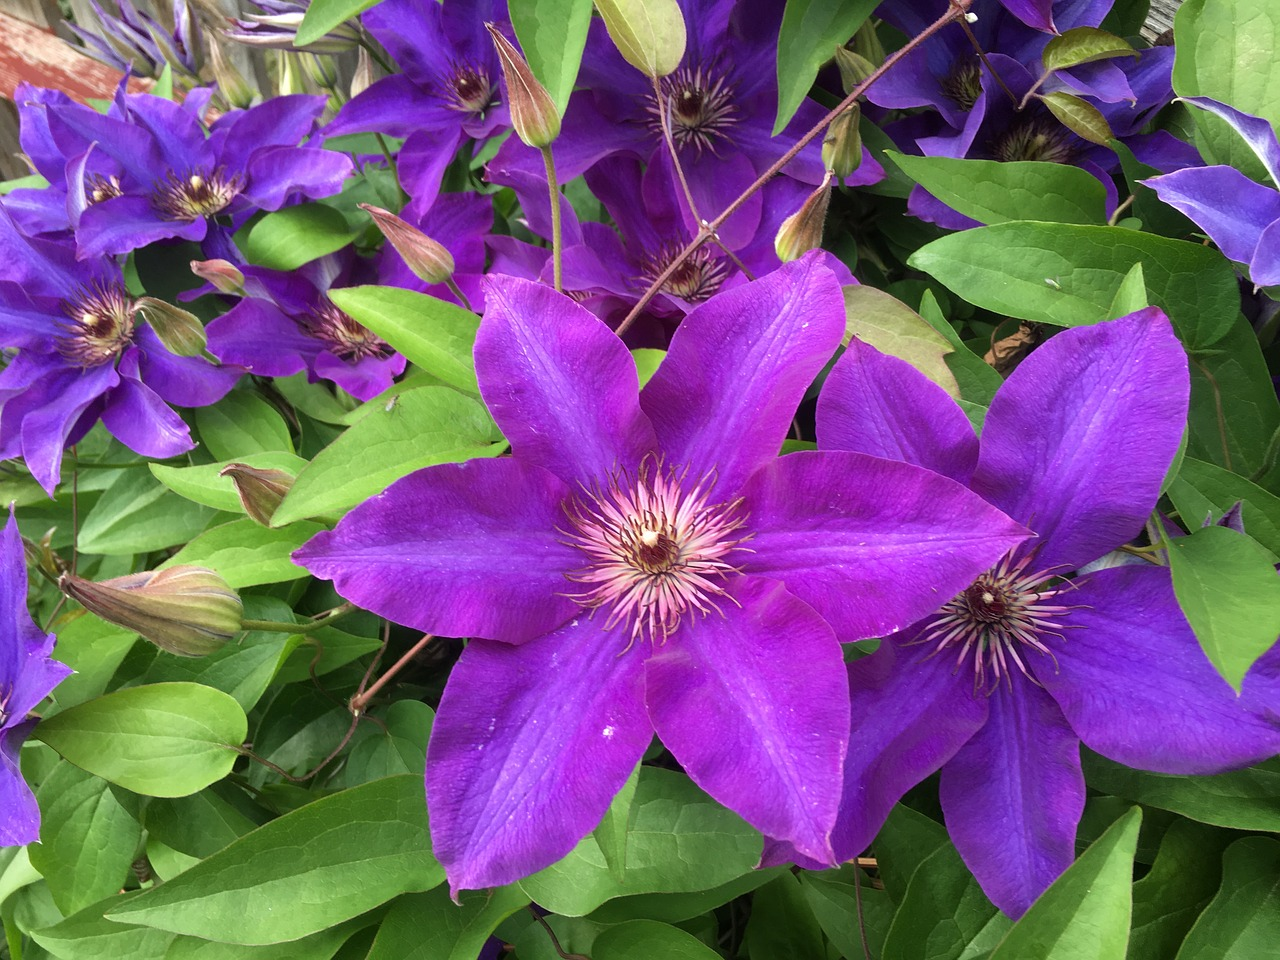 Clematisplantflowerflorasummer Free Photo From Needpix